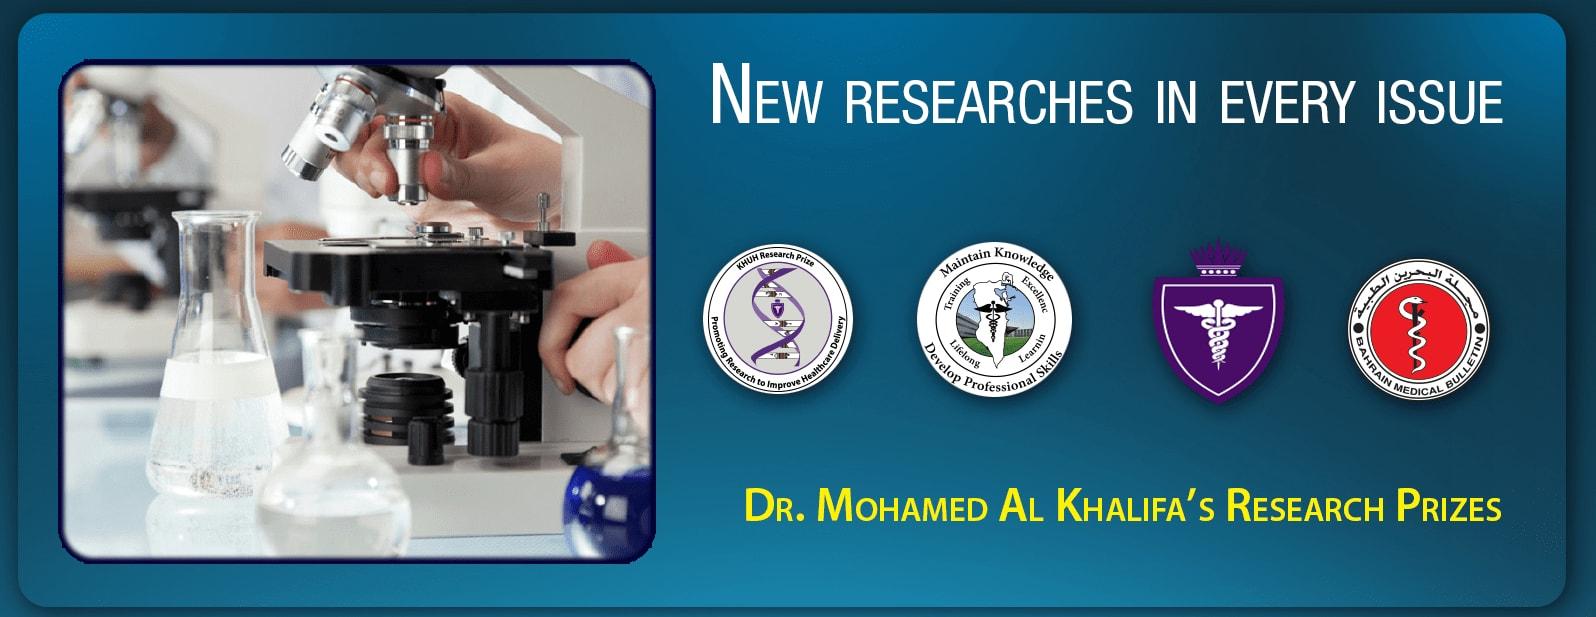 Bahrain Medical Bulletin